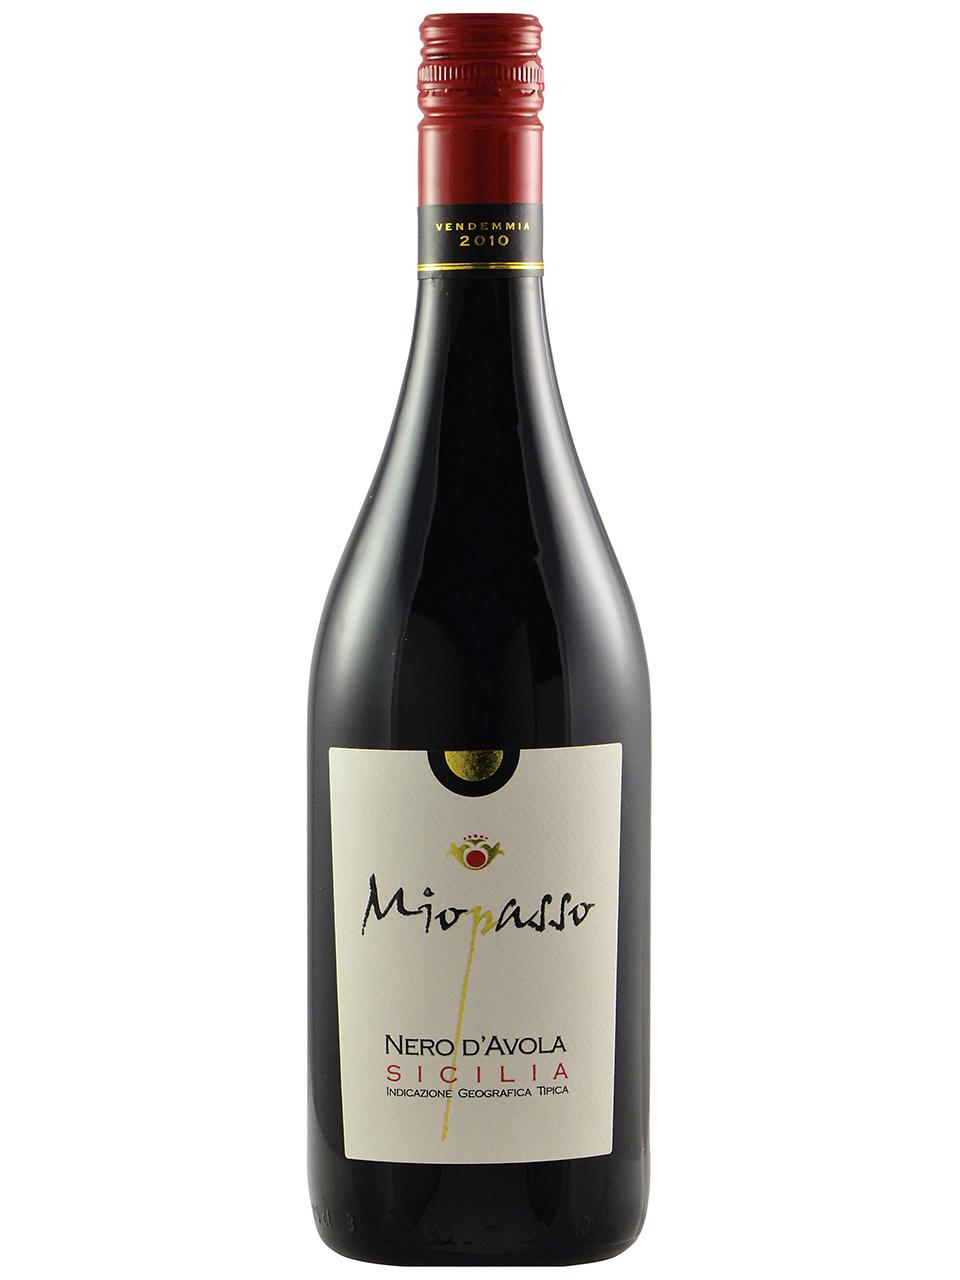 Miopasso Nero d'Avola Sicilia IGT